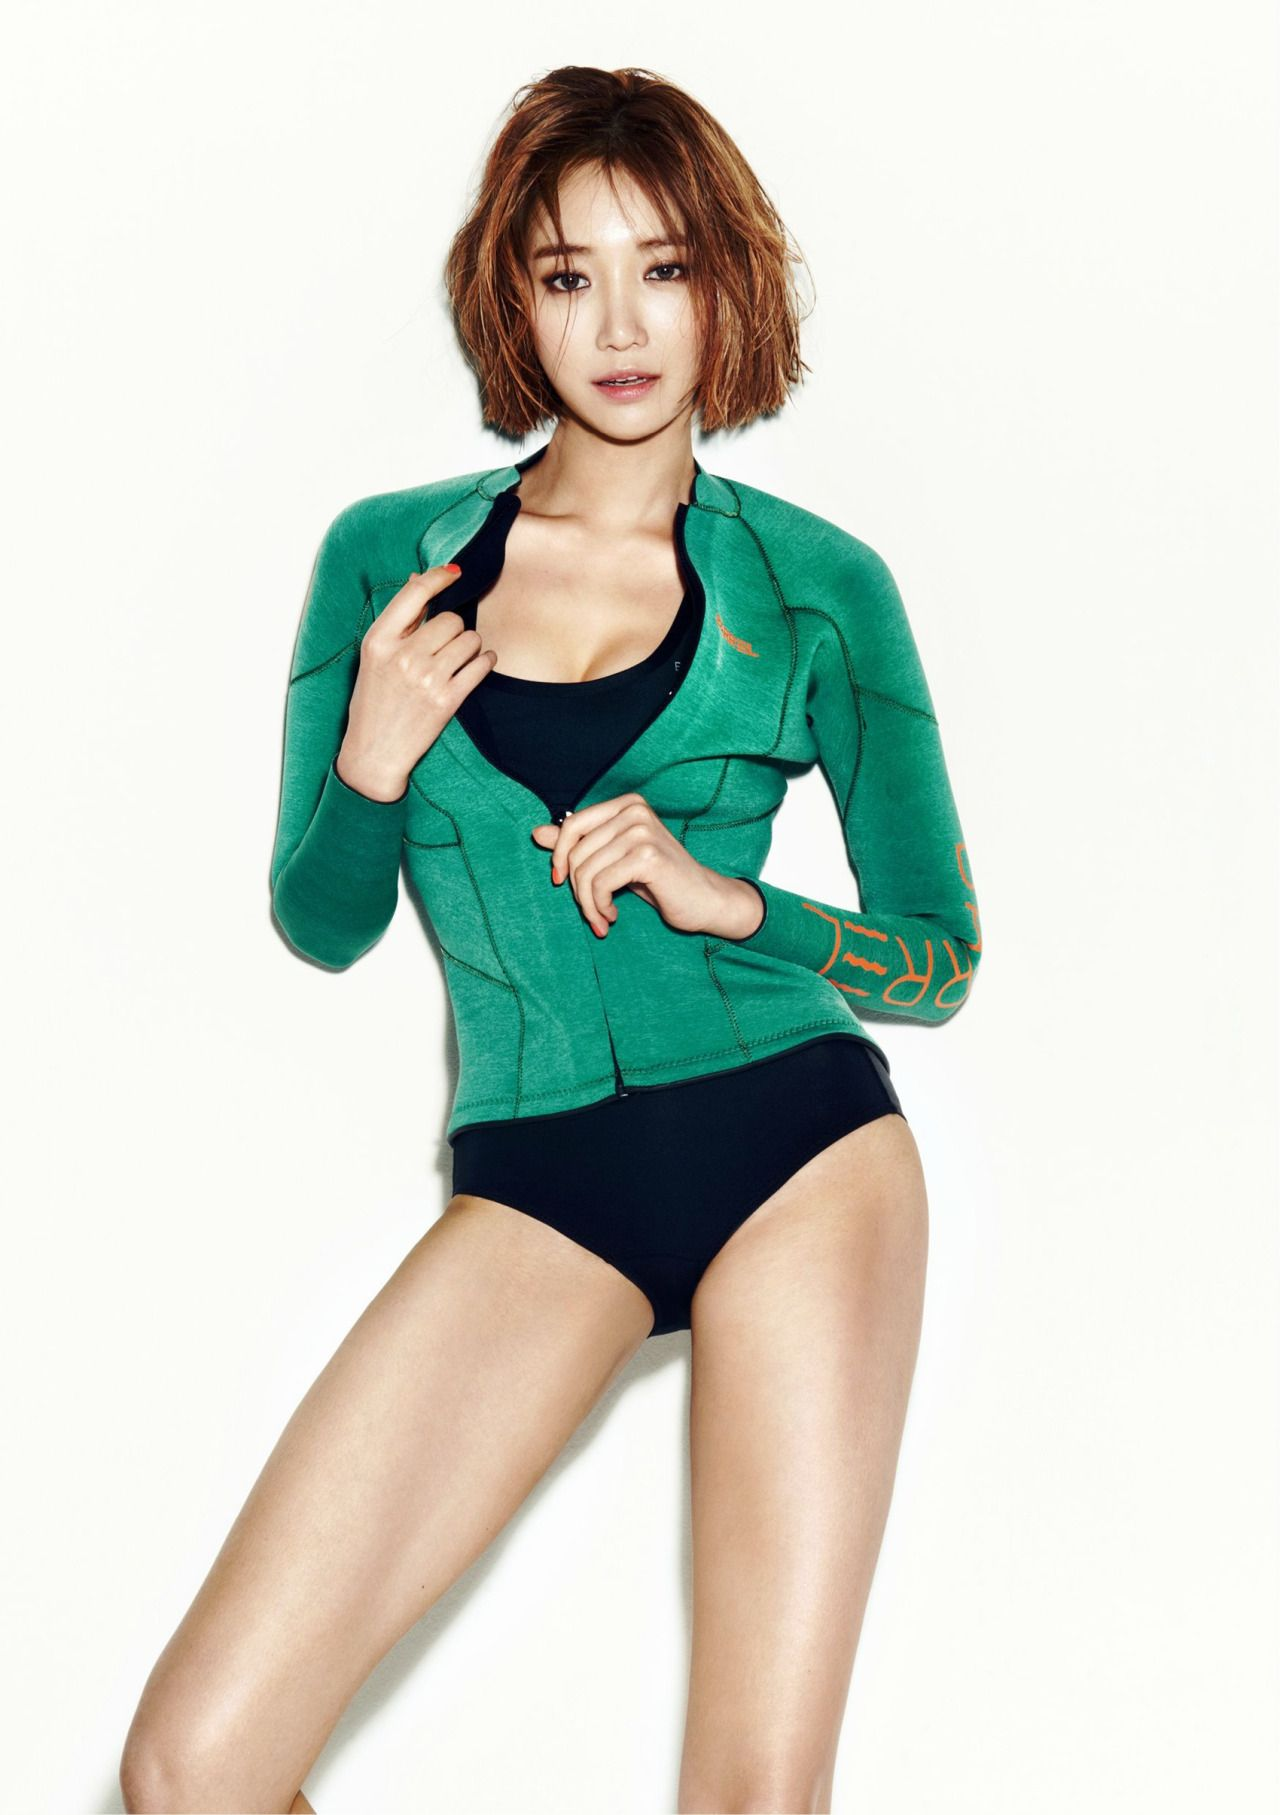 koh joon hee dating sites